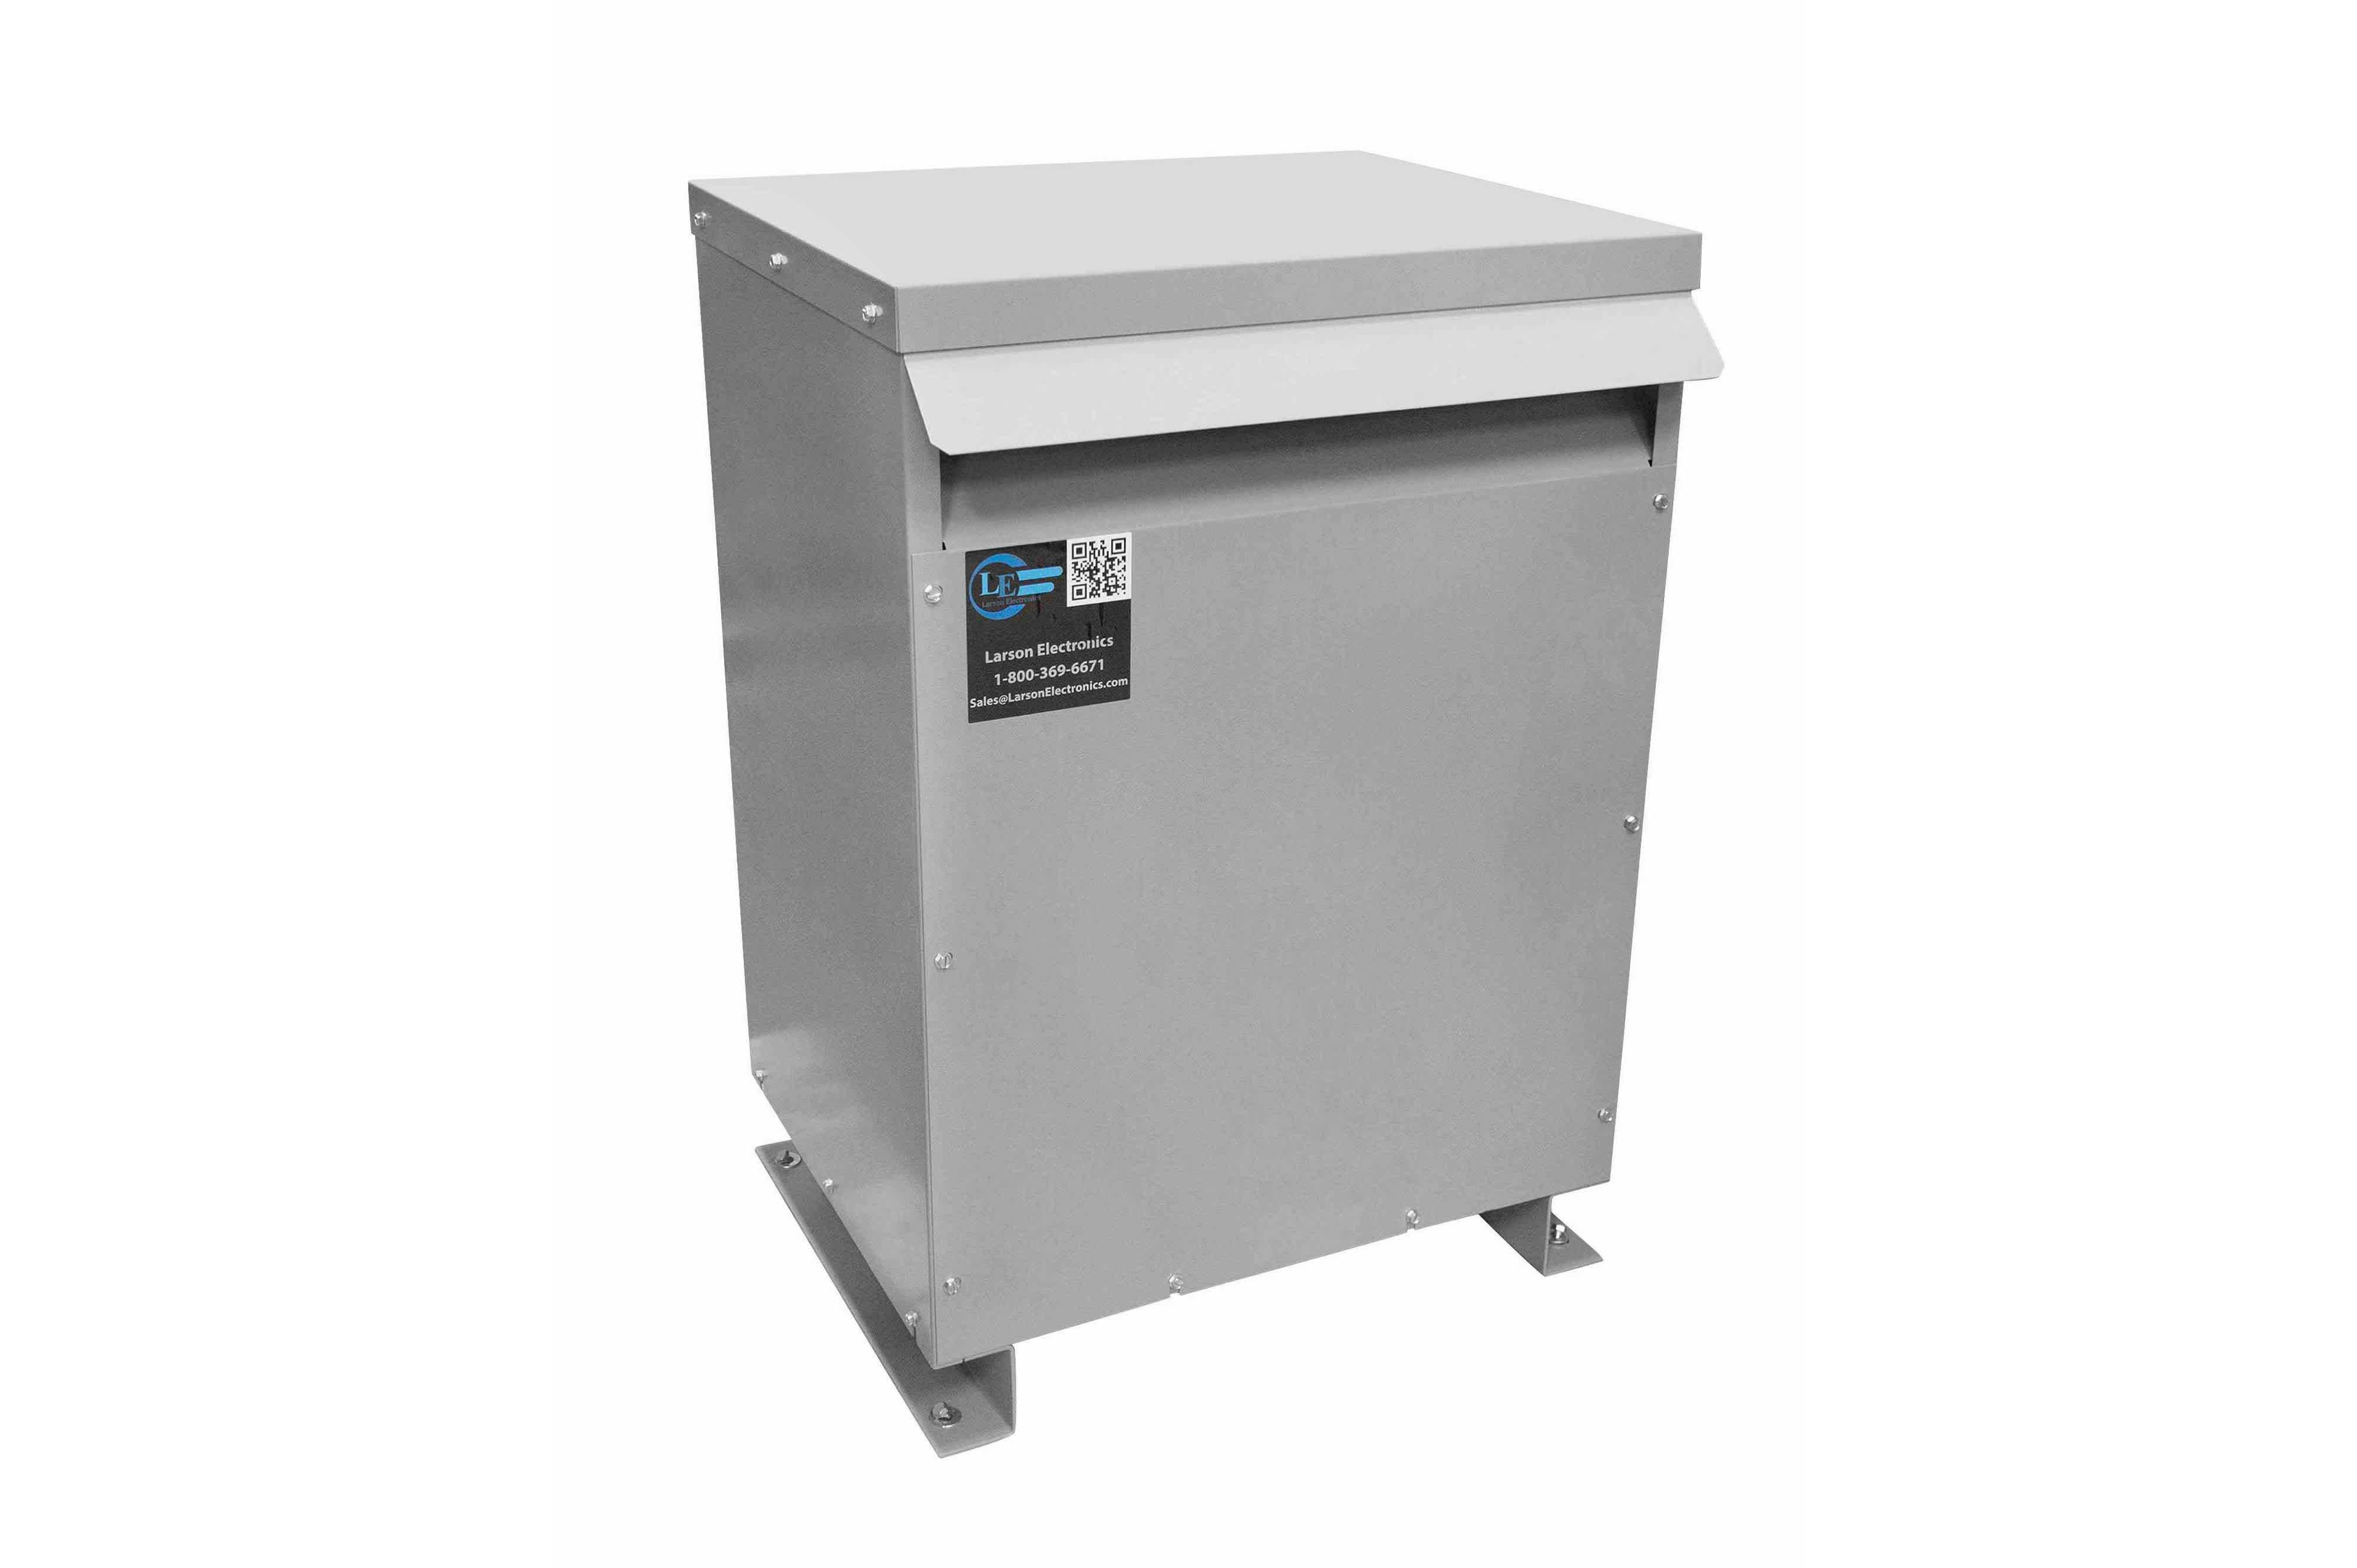 800 kVA 3PH Isolation Transformer, 460V Wye Primary, 400V Delta Secondary, N3R, Ventilated, 60 Hz